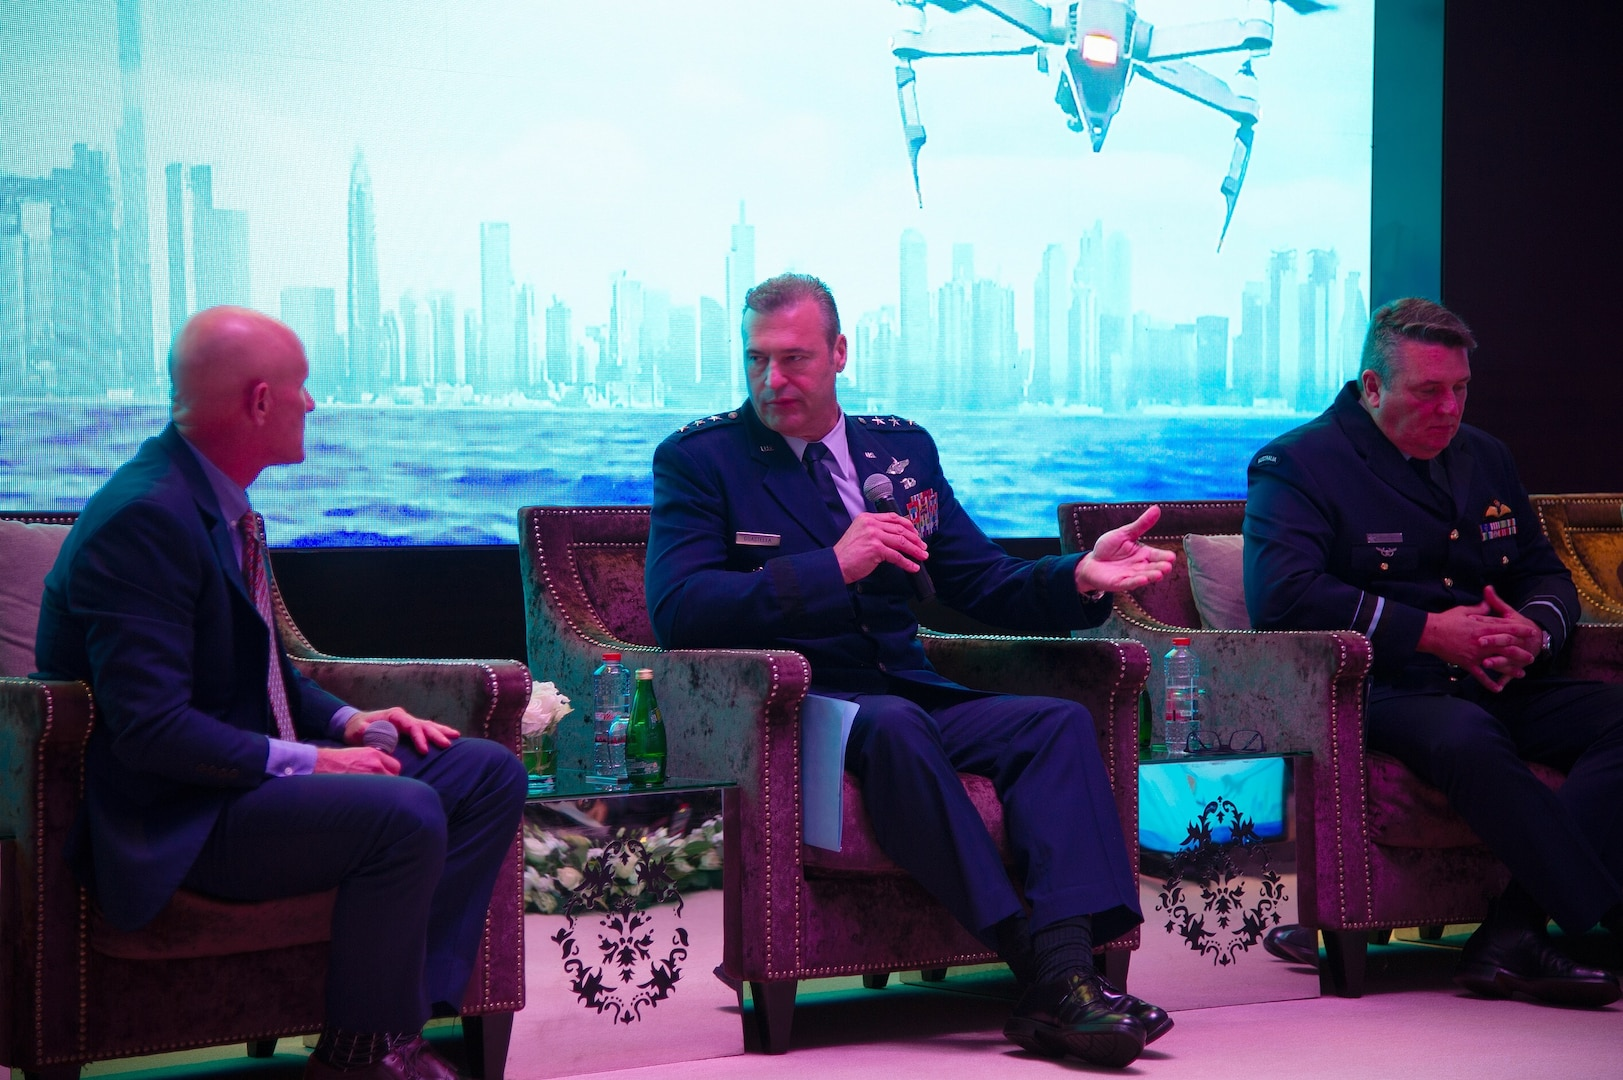 Lt. Gen. Joseph T. Guastella Jr., commander of U.S. Air Forces Central Command, speaks at the 2019 Dubai International Air Chiefs Conference in Dubai, United Arab Emirates, Nov. 16, 2019.